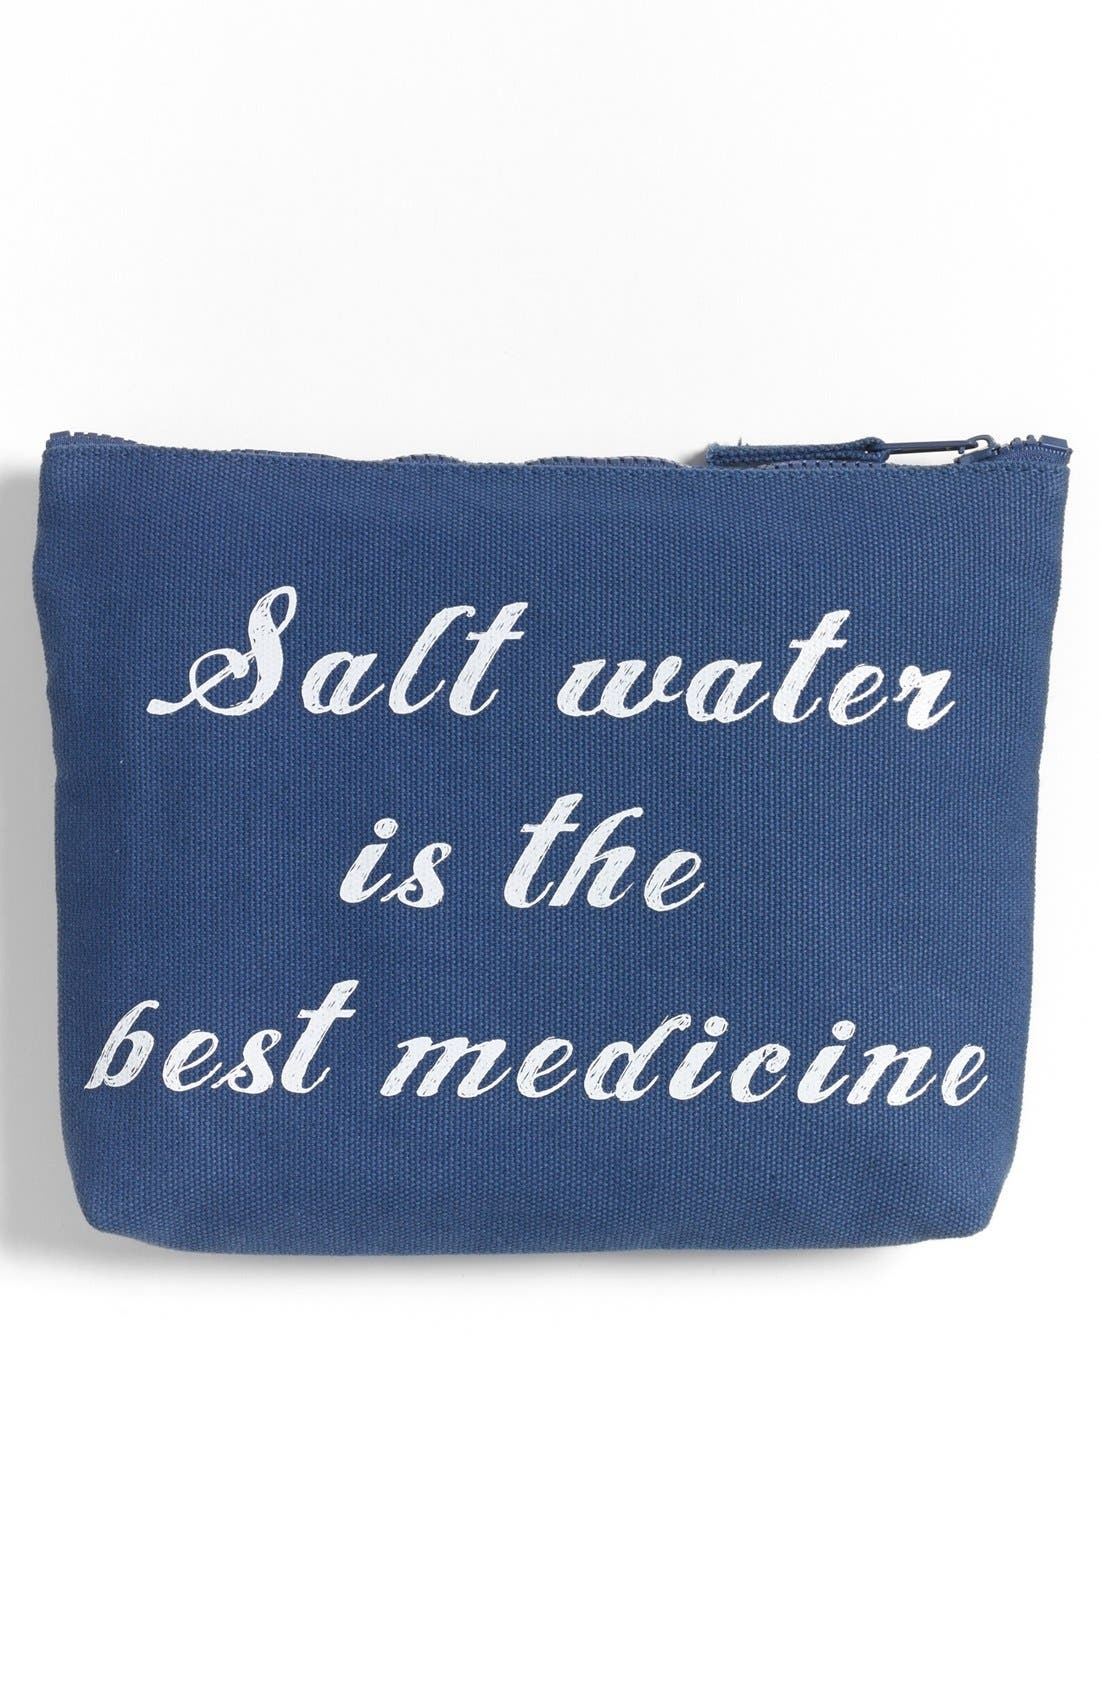 Alternate Image 2  - Wildfox 'Salt Water' Cover-Up & Bikini Bag